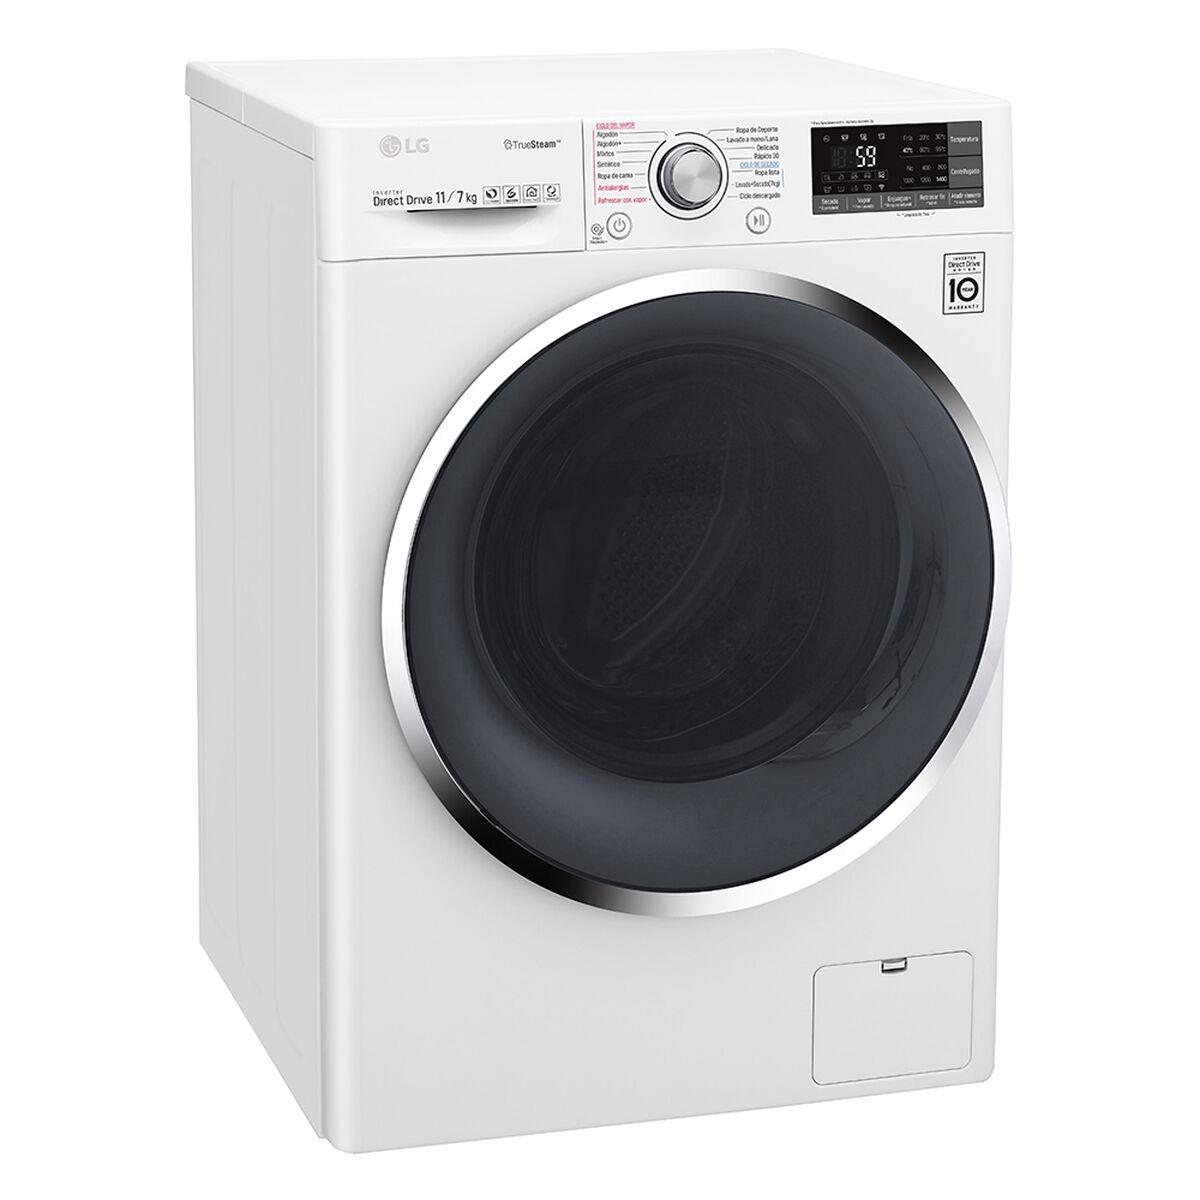 Lavadora Secadora LG WD11WBS6D 11 kg/7 kg